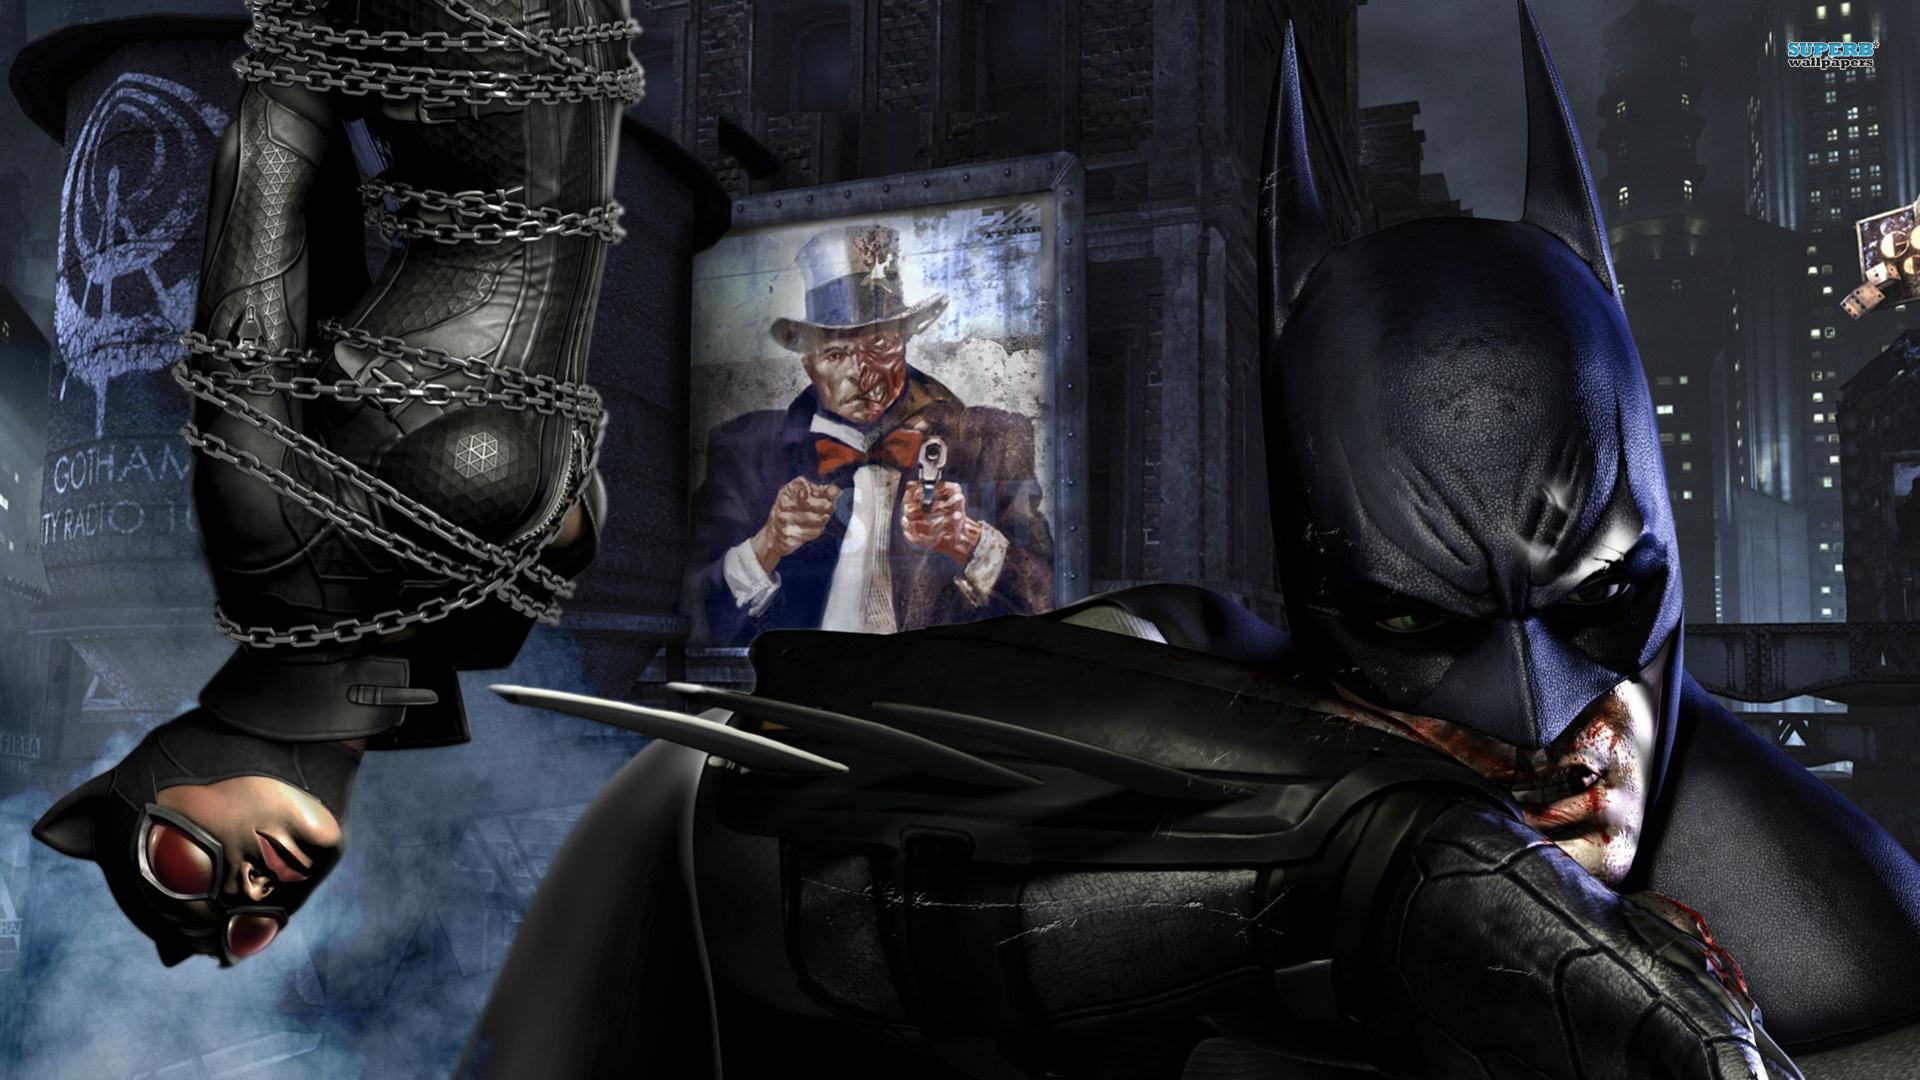 Riddler Scarecrow Playstation 3 Pc Game Batman Batman